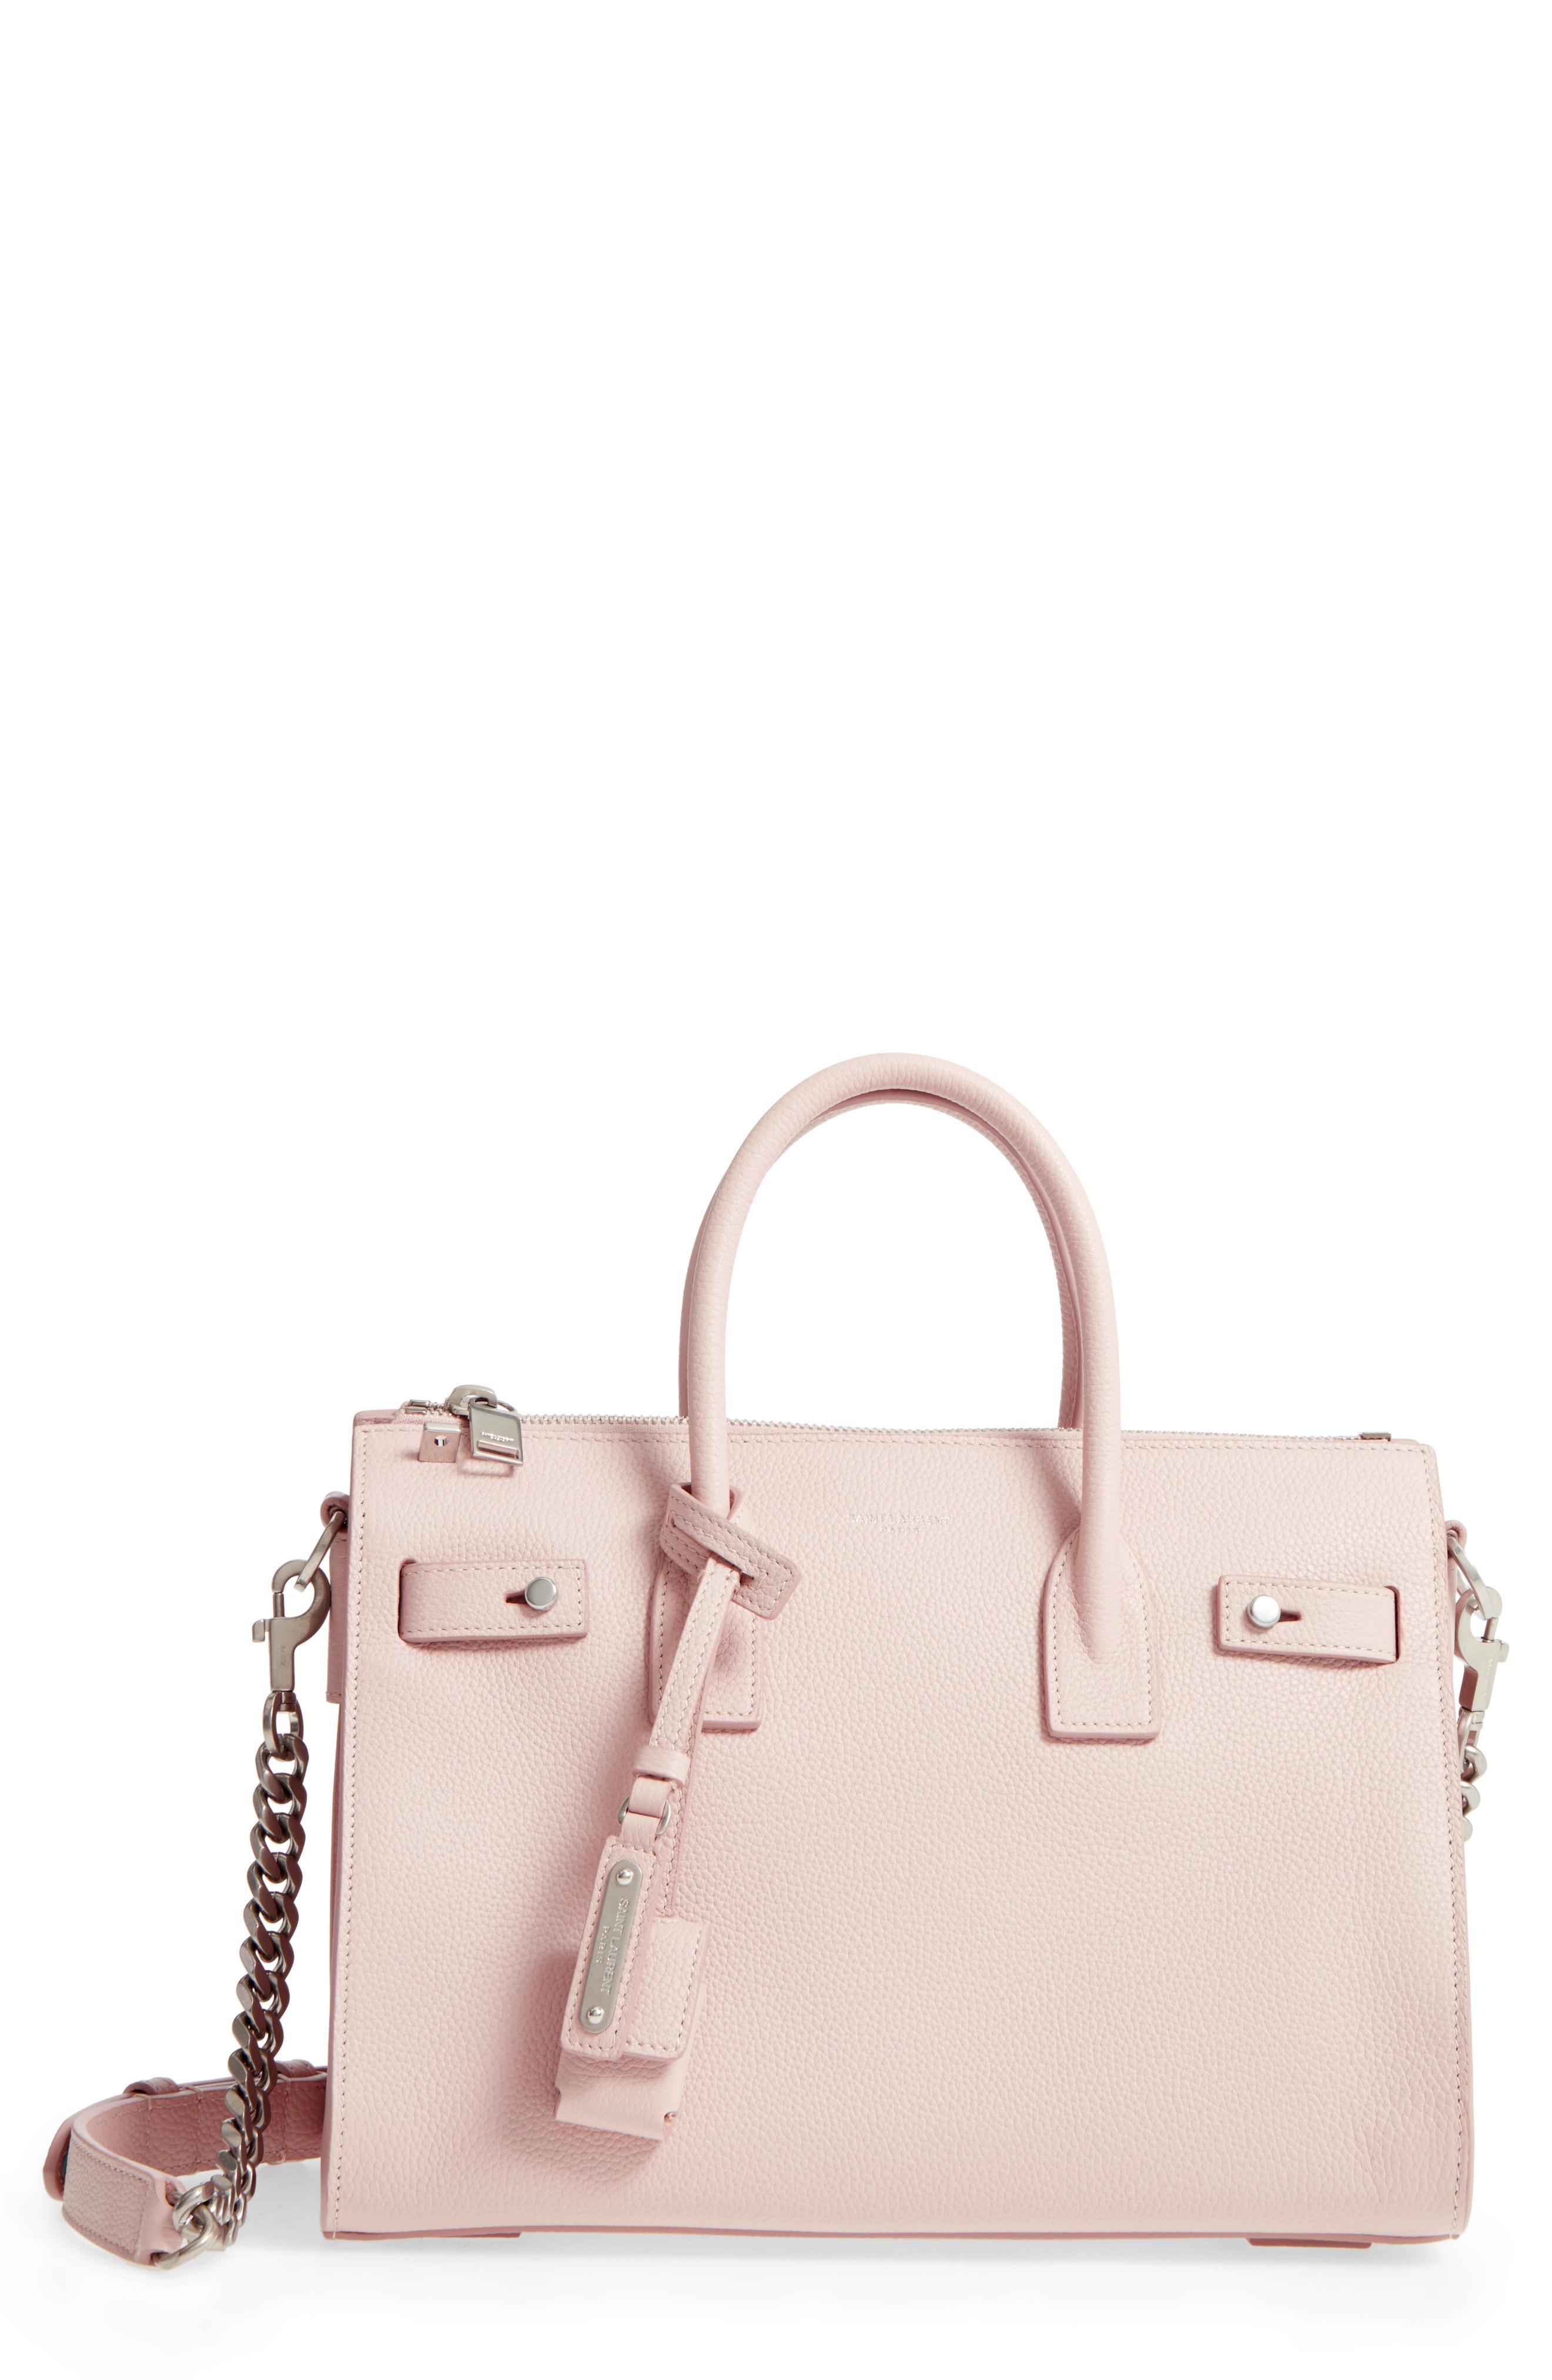 c04be1c41271 Saint Laurent Sac De Jour Baby Supple Bonded Carryall Tote Bag In Marble  Pink